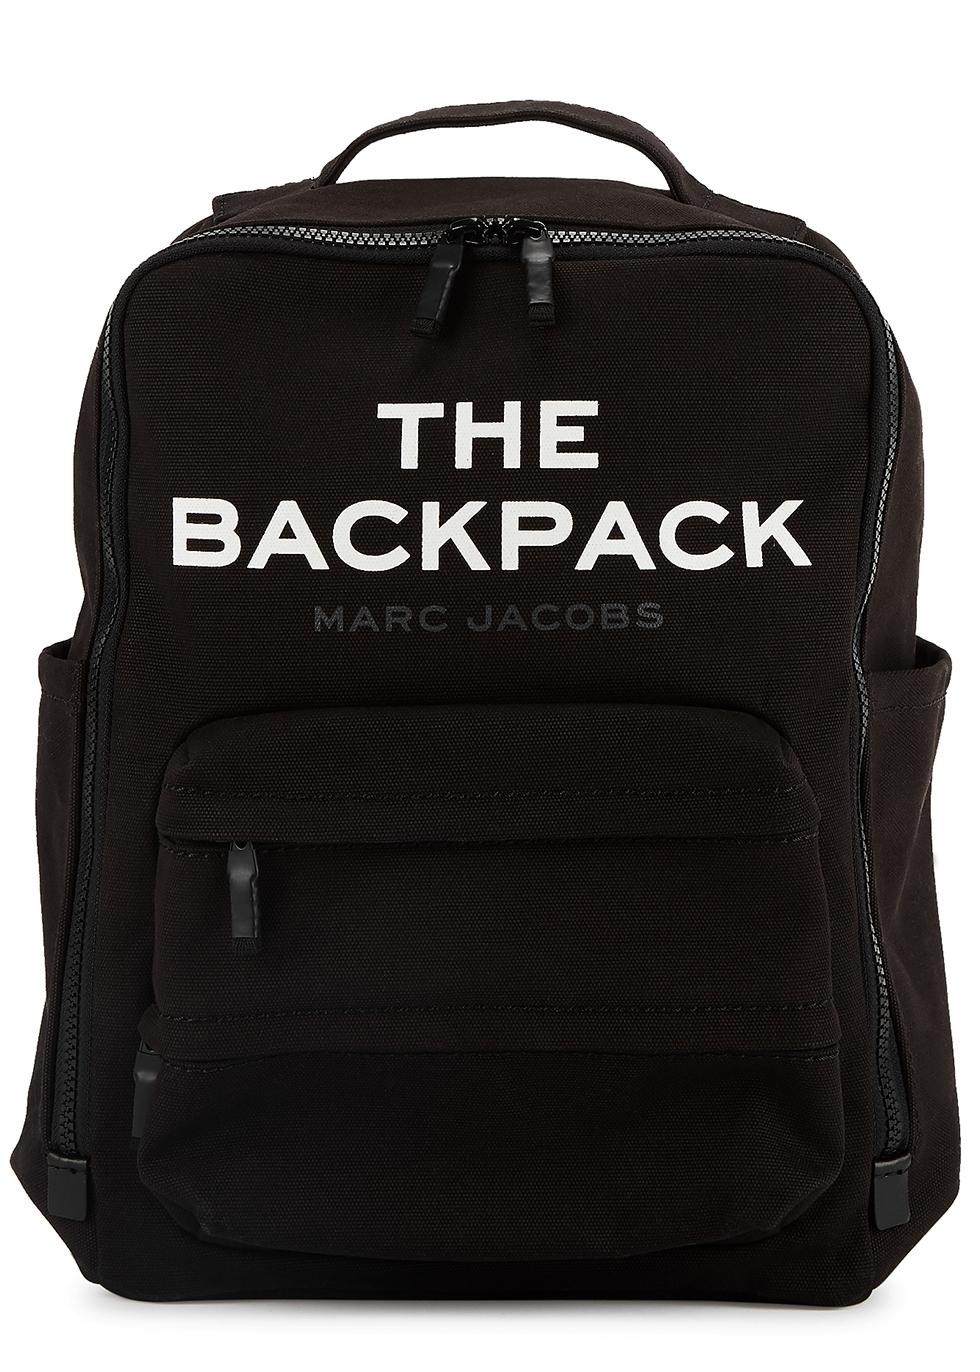 The Backpack black canvas bag